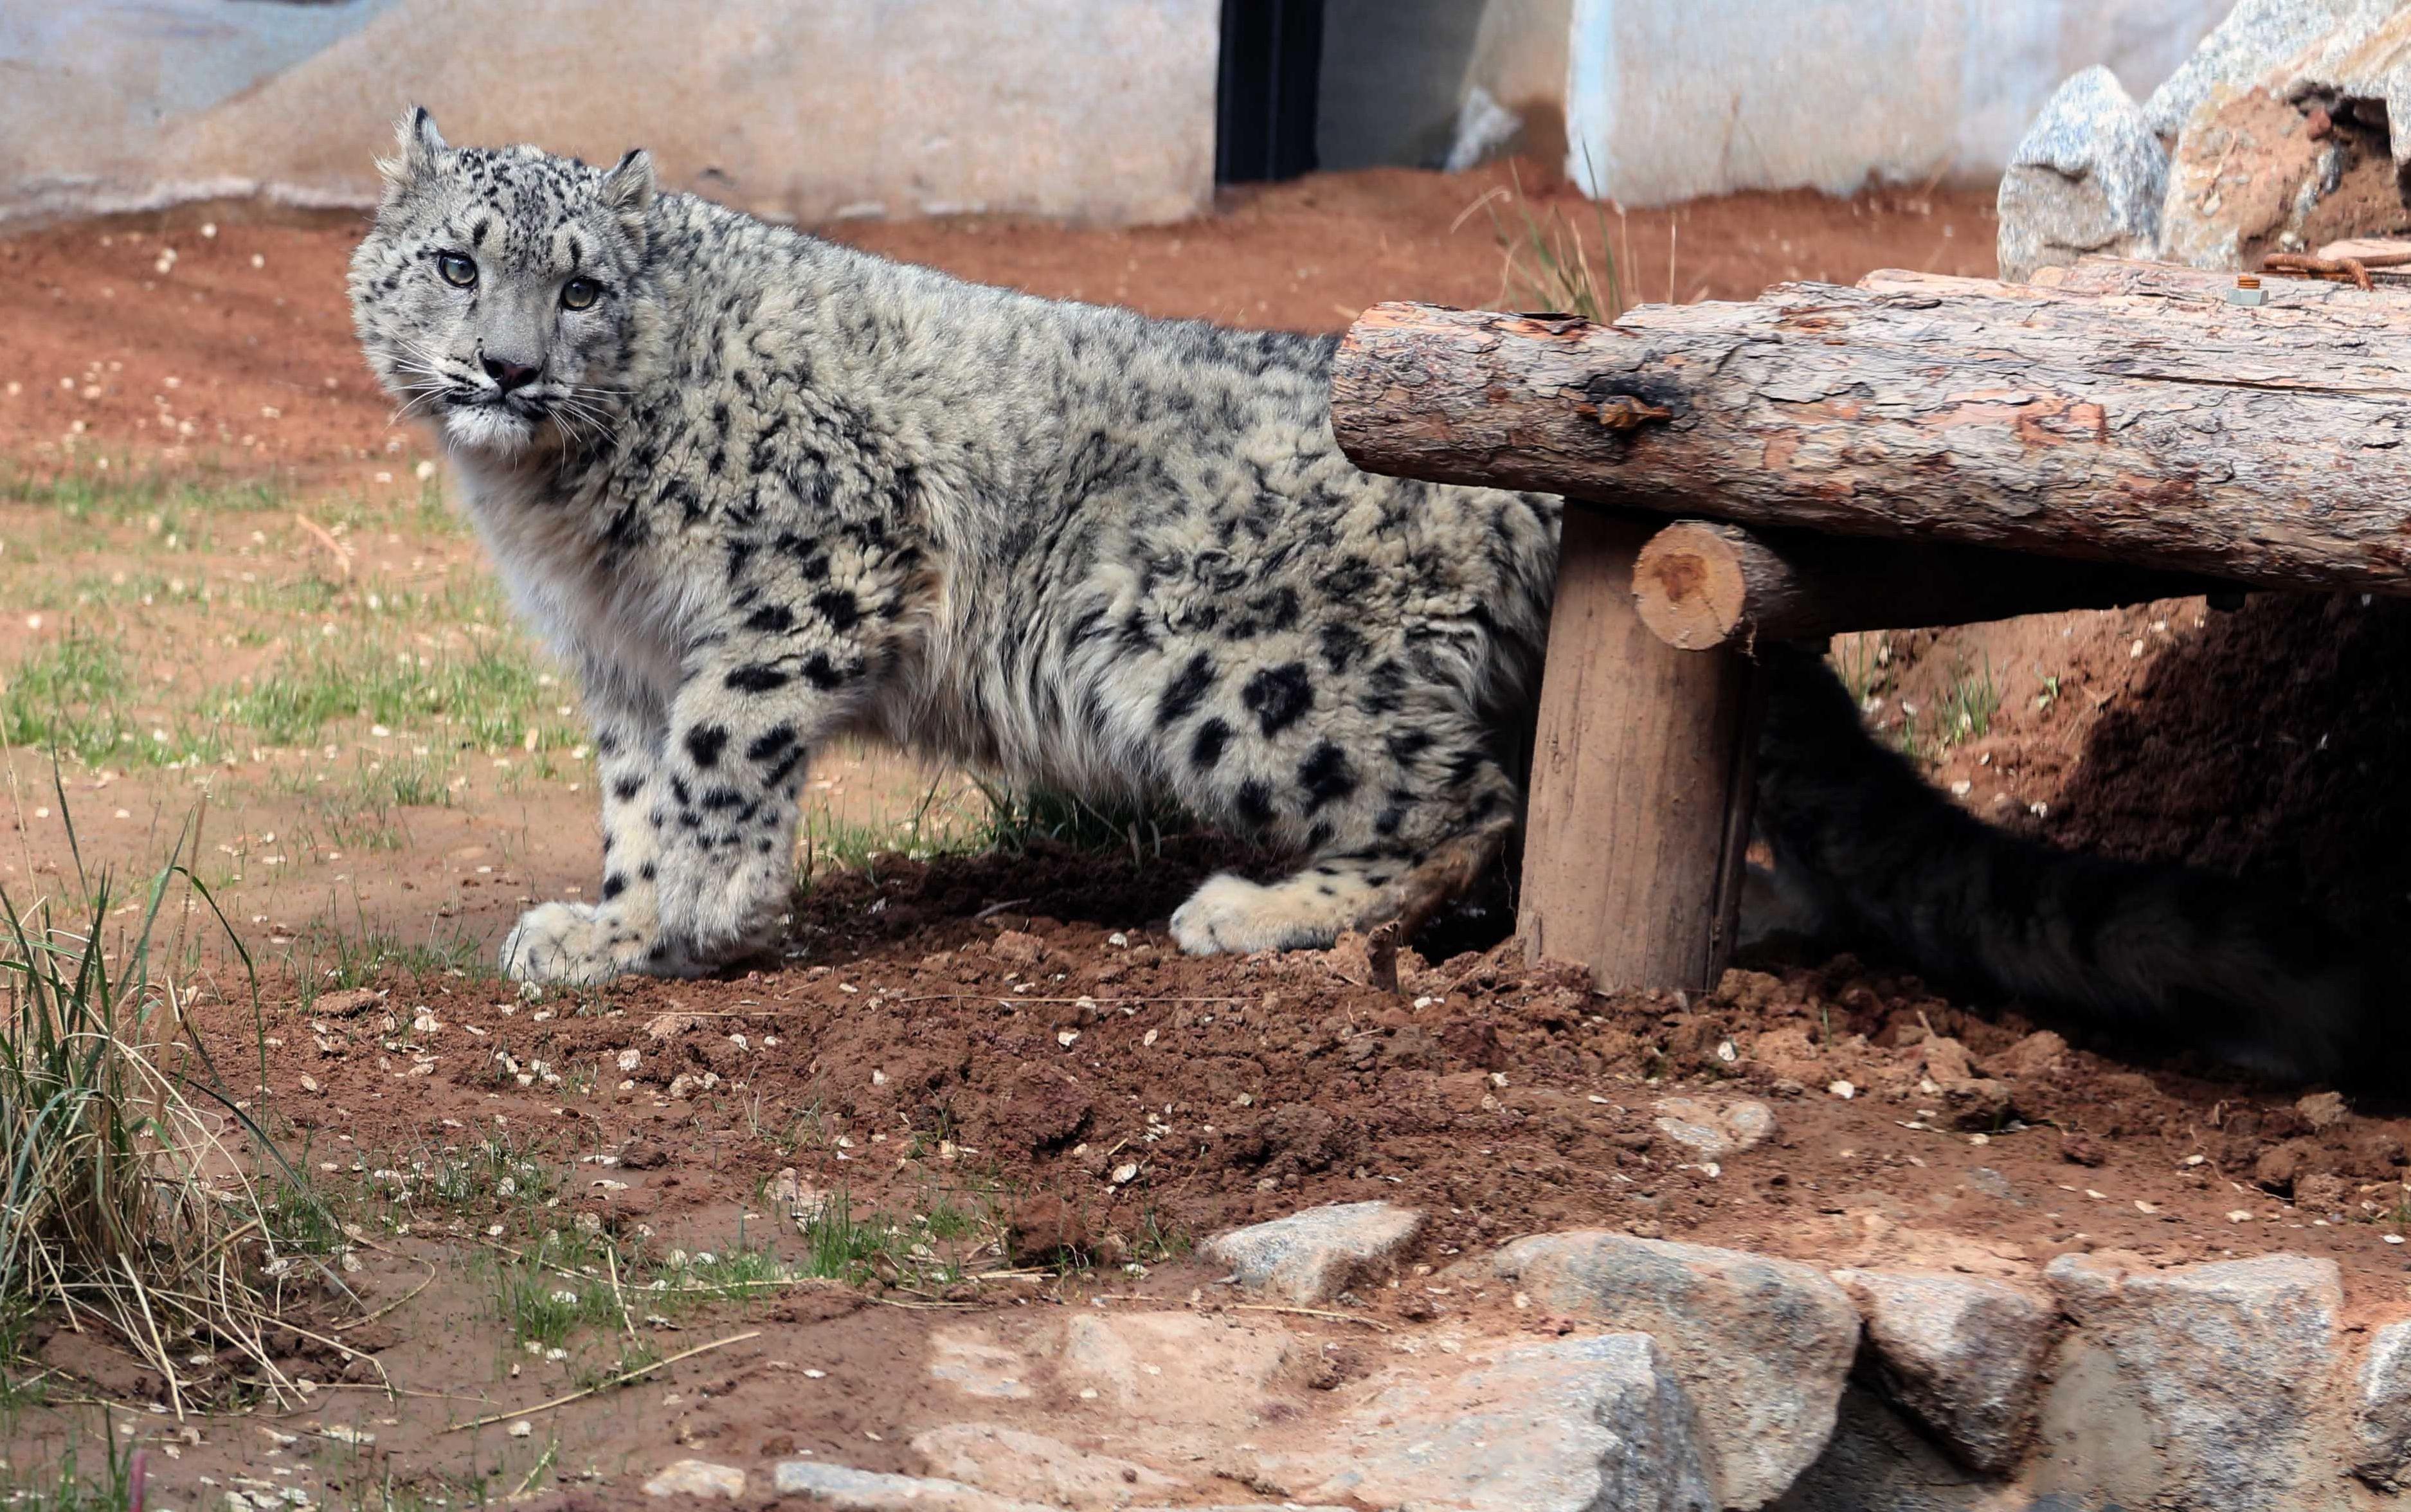 Snow leopard census: now it is off endangered species list